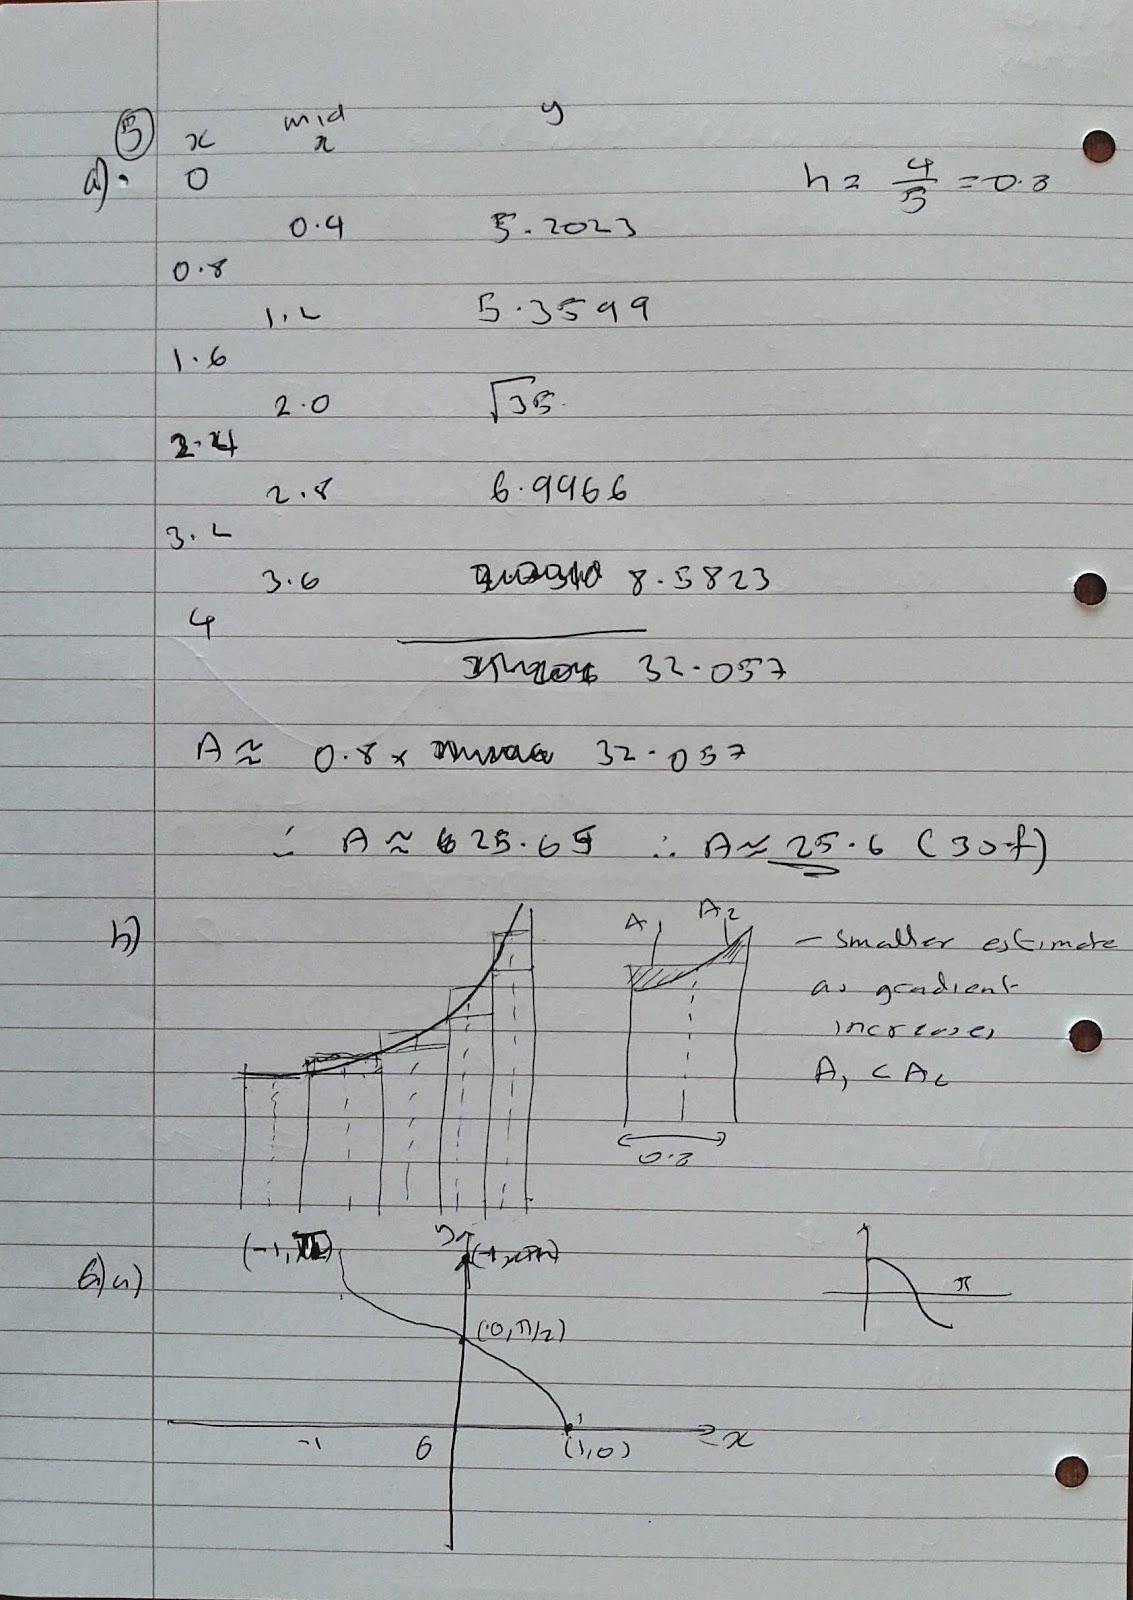 A Level Maths Notes: AQA Core 3 (C3) Summer 2013 Exam